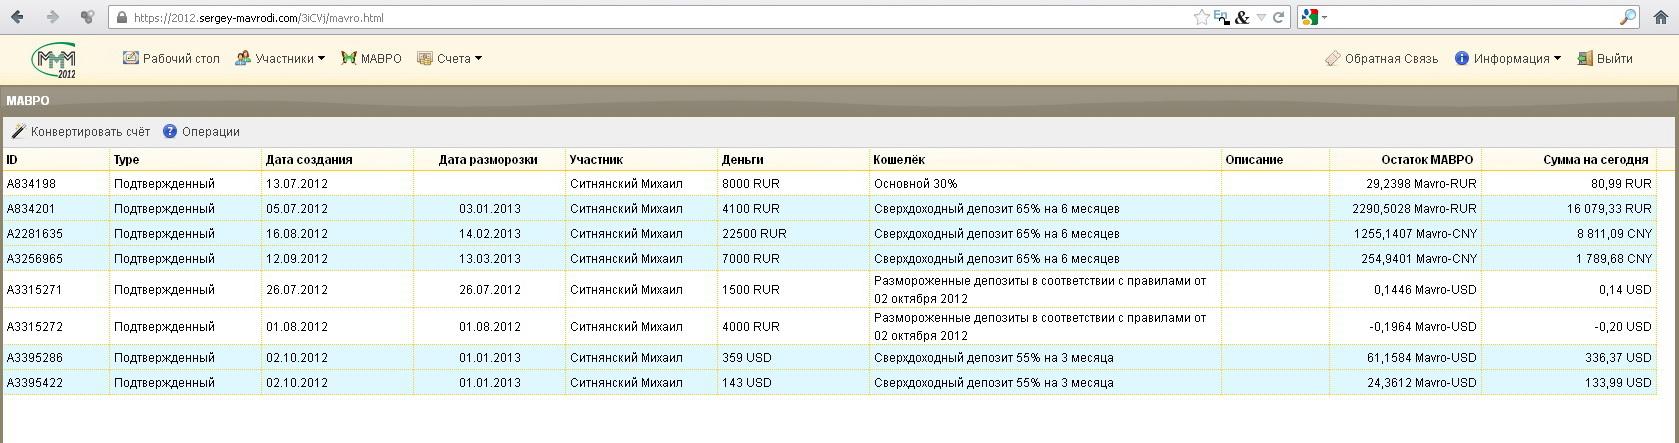 Мои вклады в МММ-2012 на 3 октября 2012